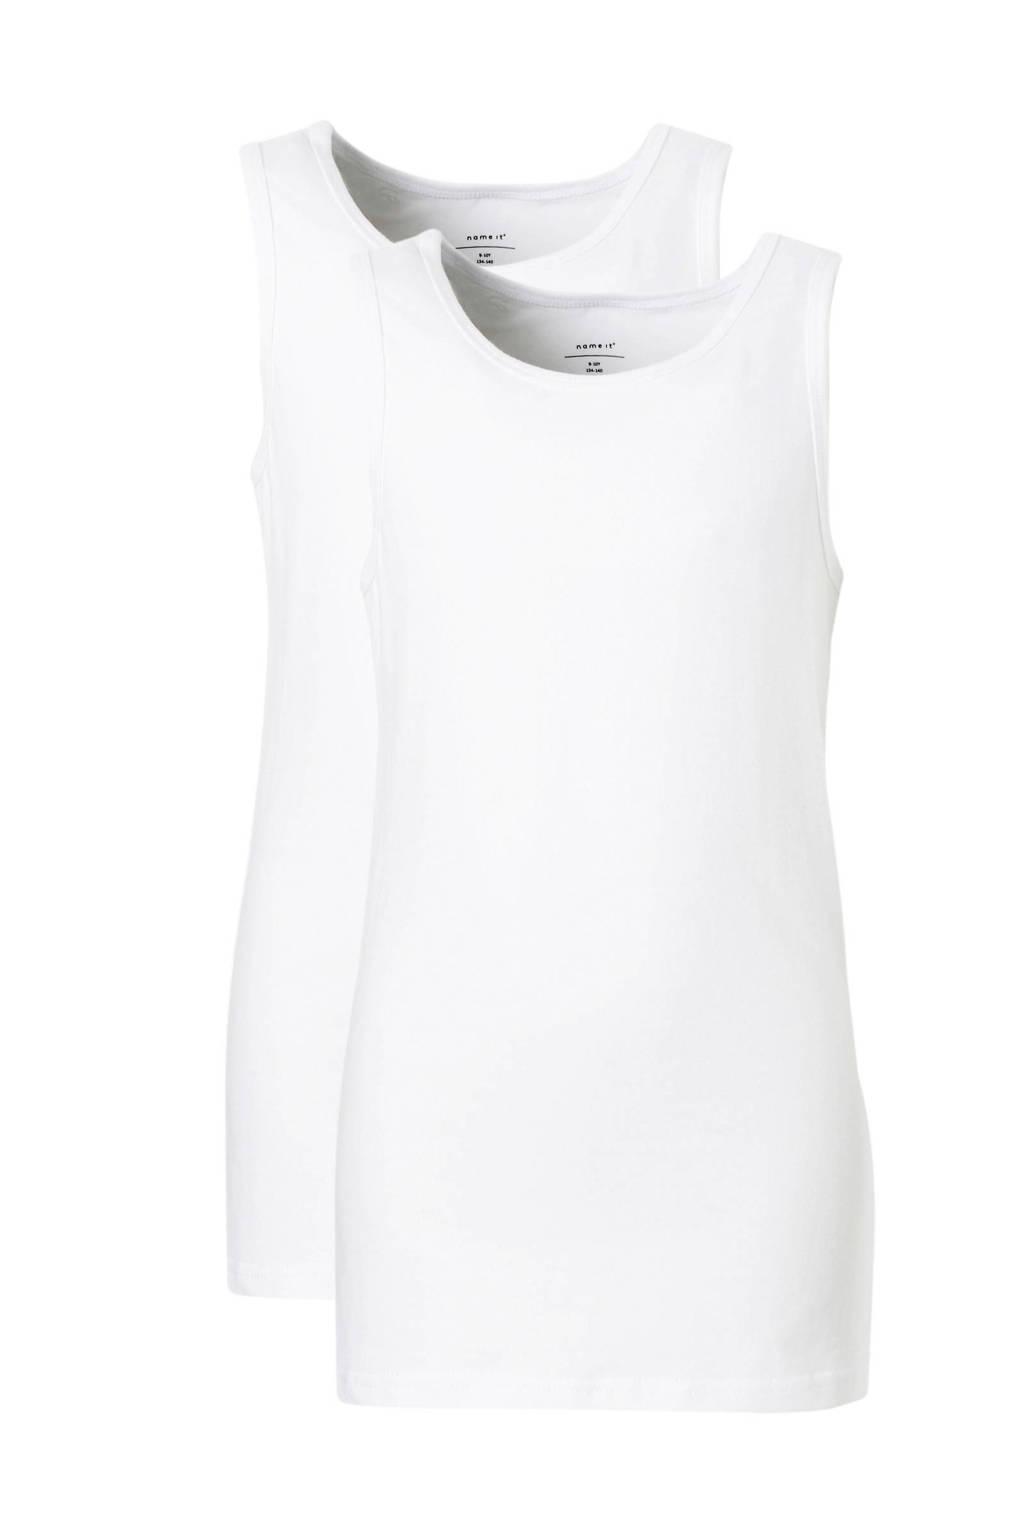 NAME IT hemd - set van 2  wit, Wit